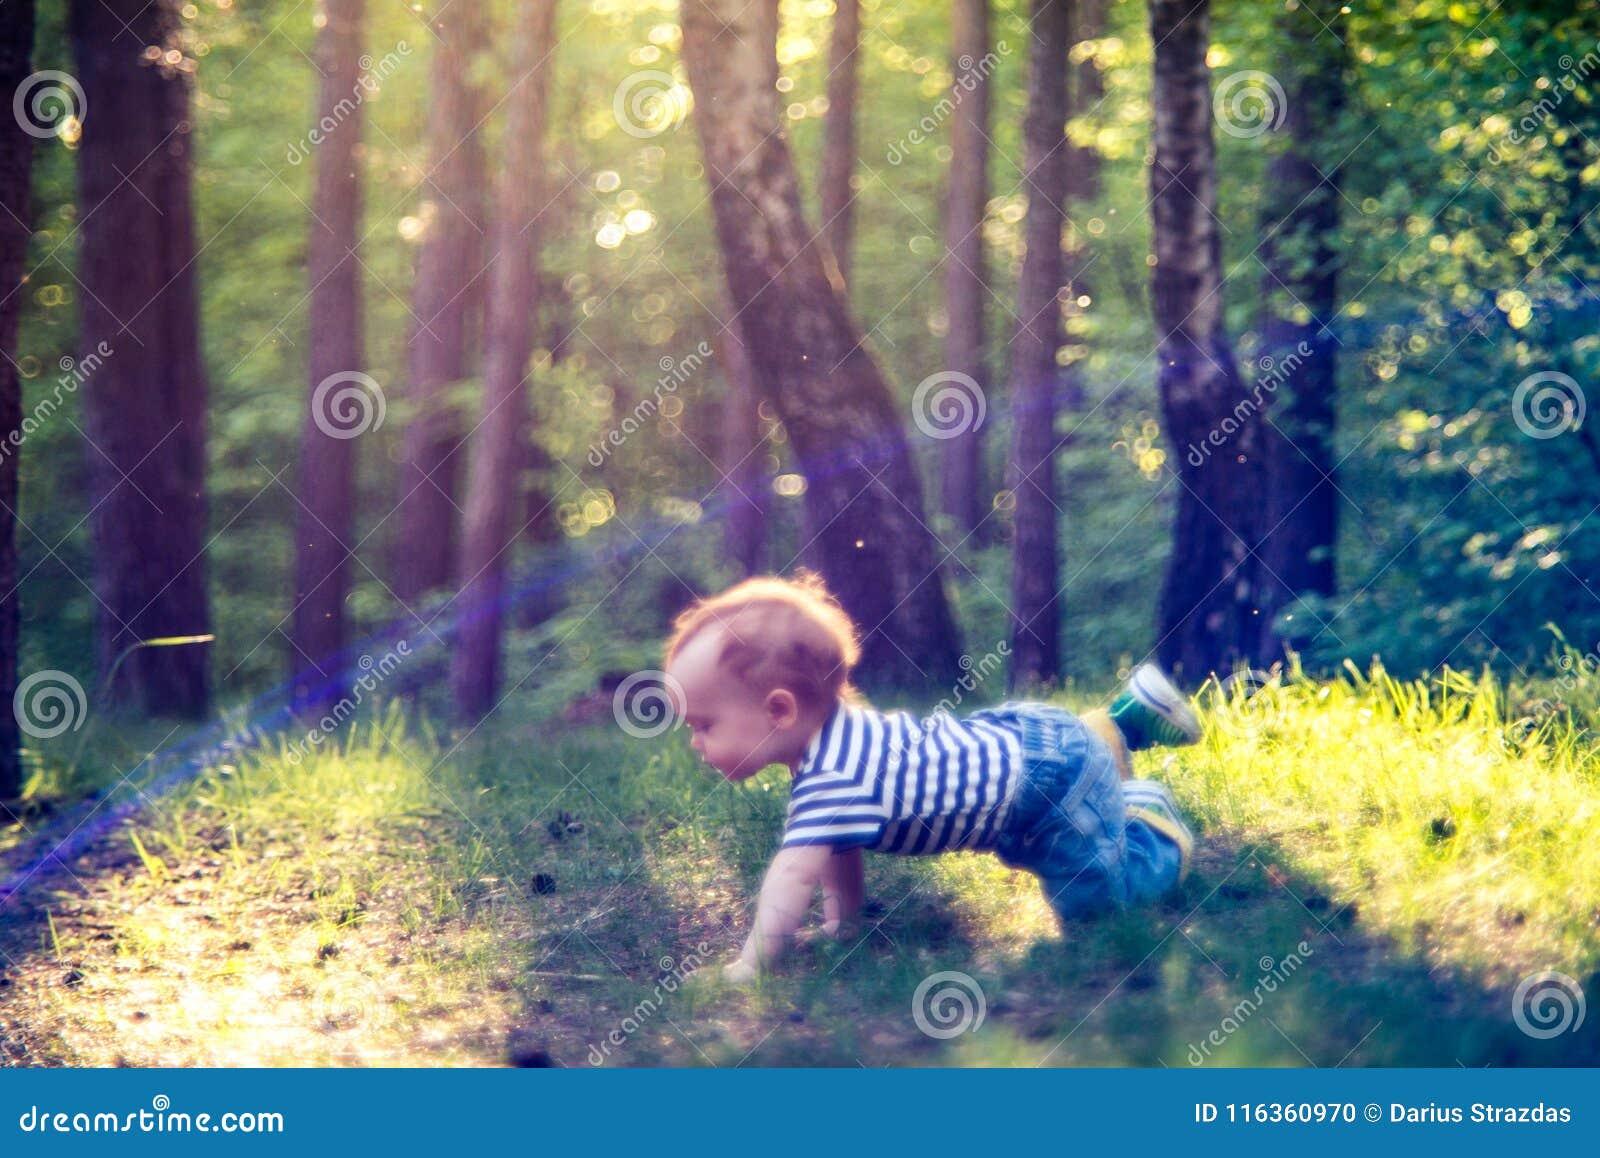 Little man boy in forest crawling